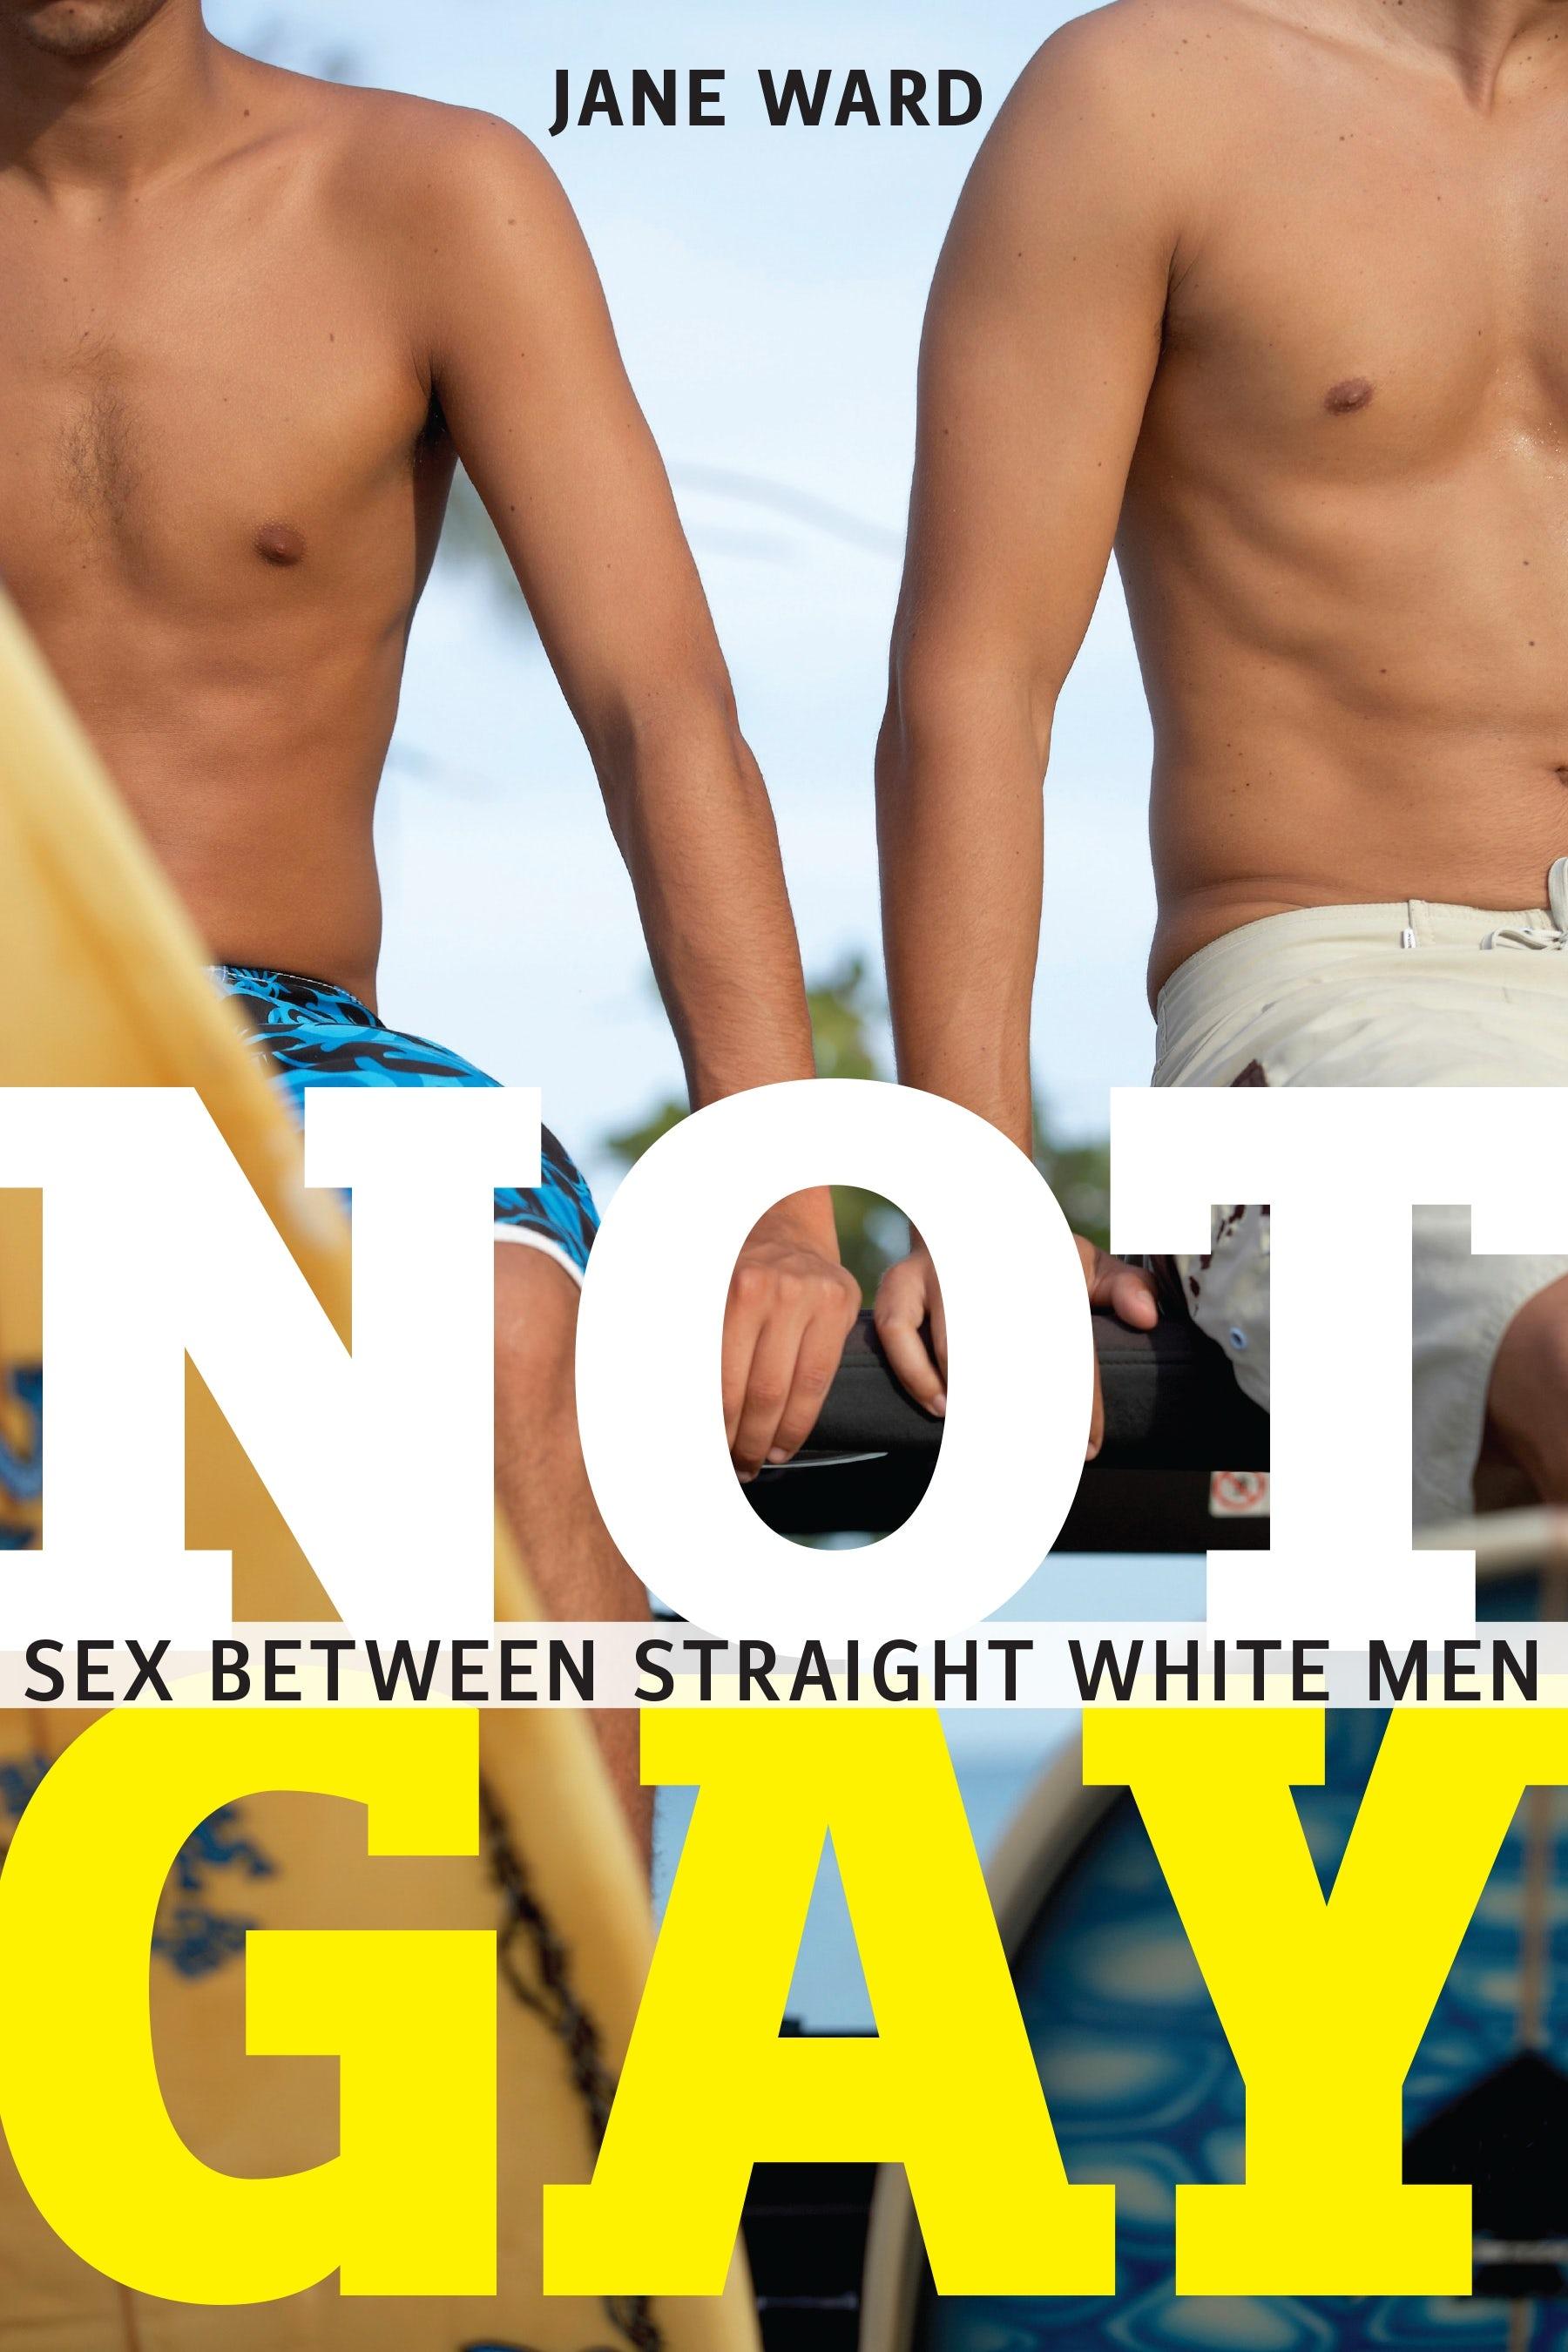 Alle schwulen Sex-Positionen